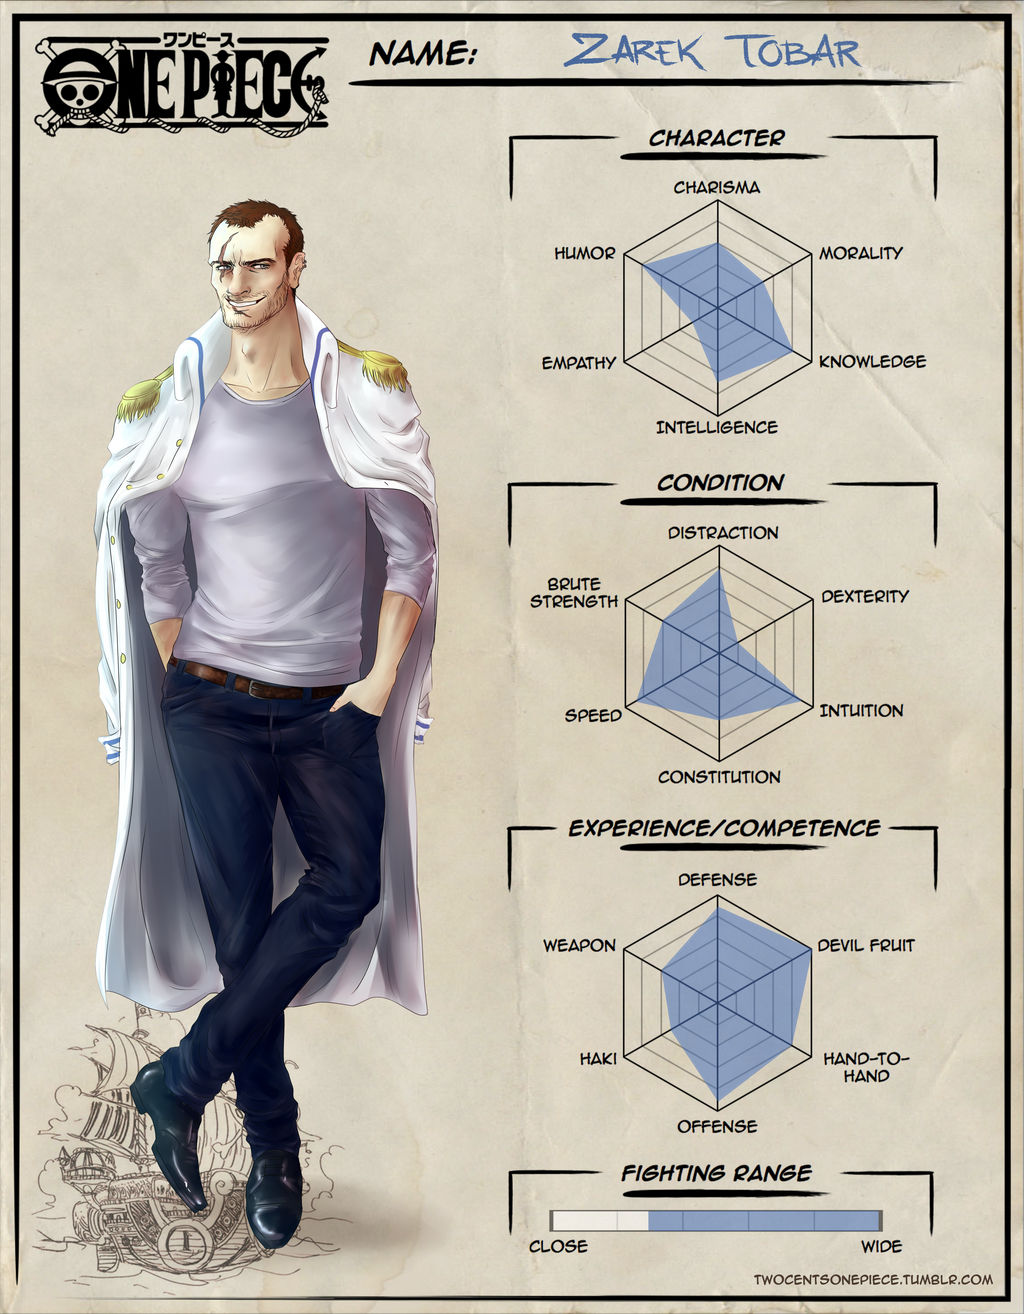 Zarek Tobar's ability chart by artJou